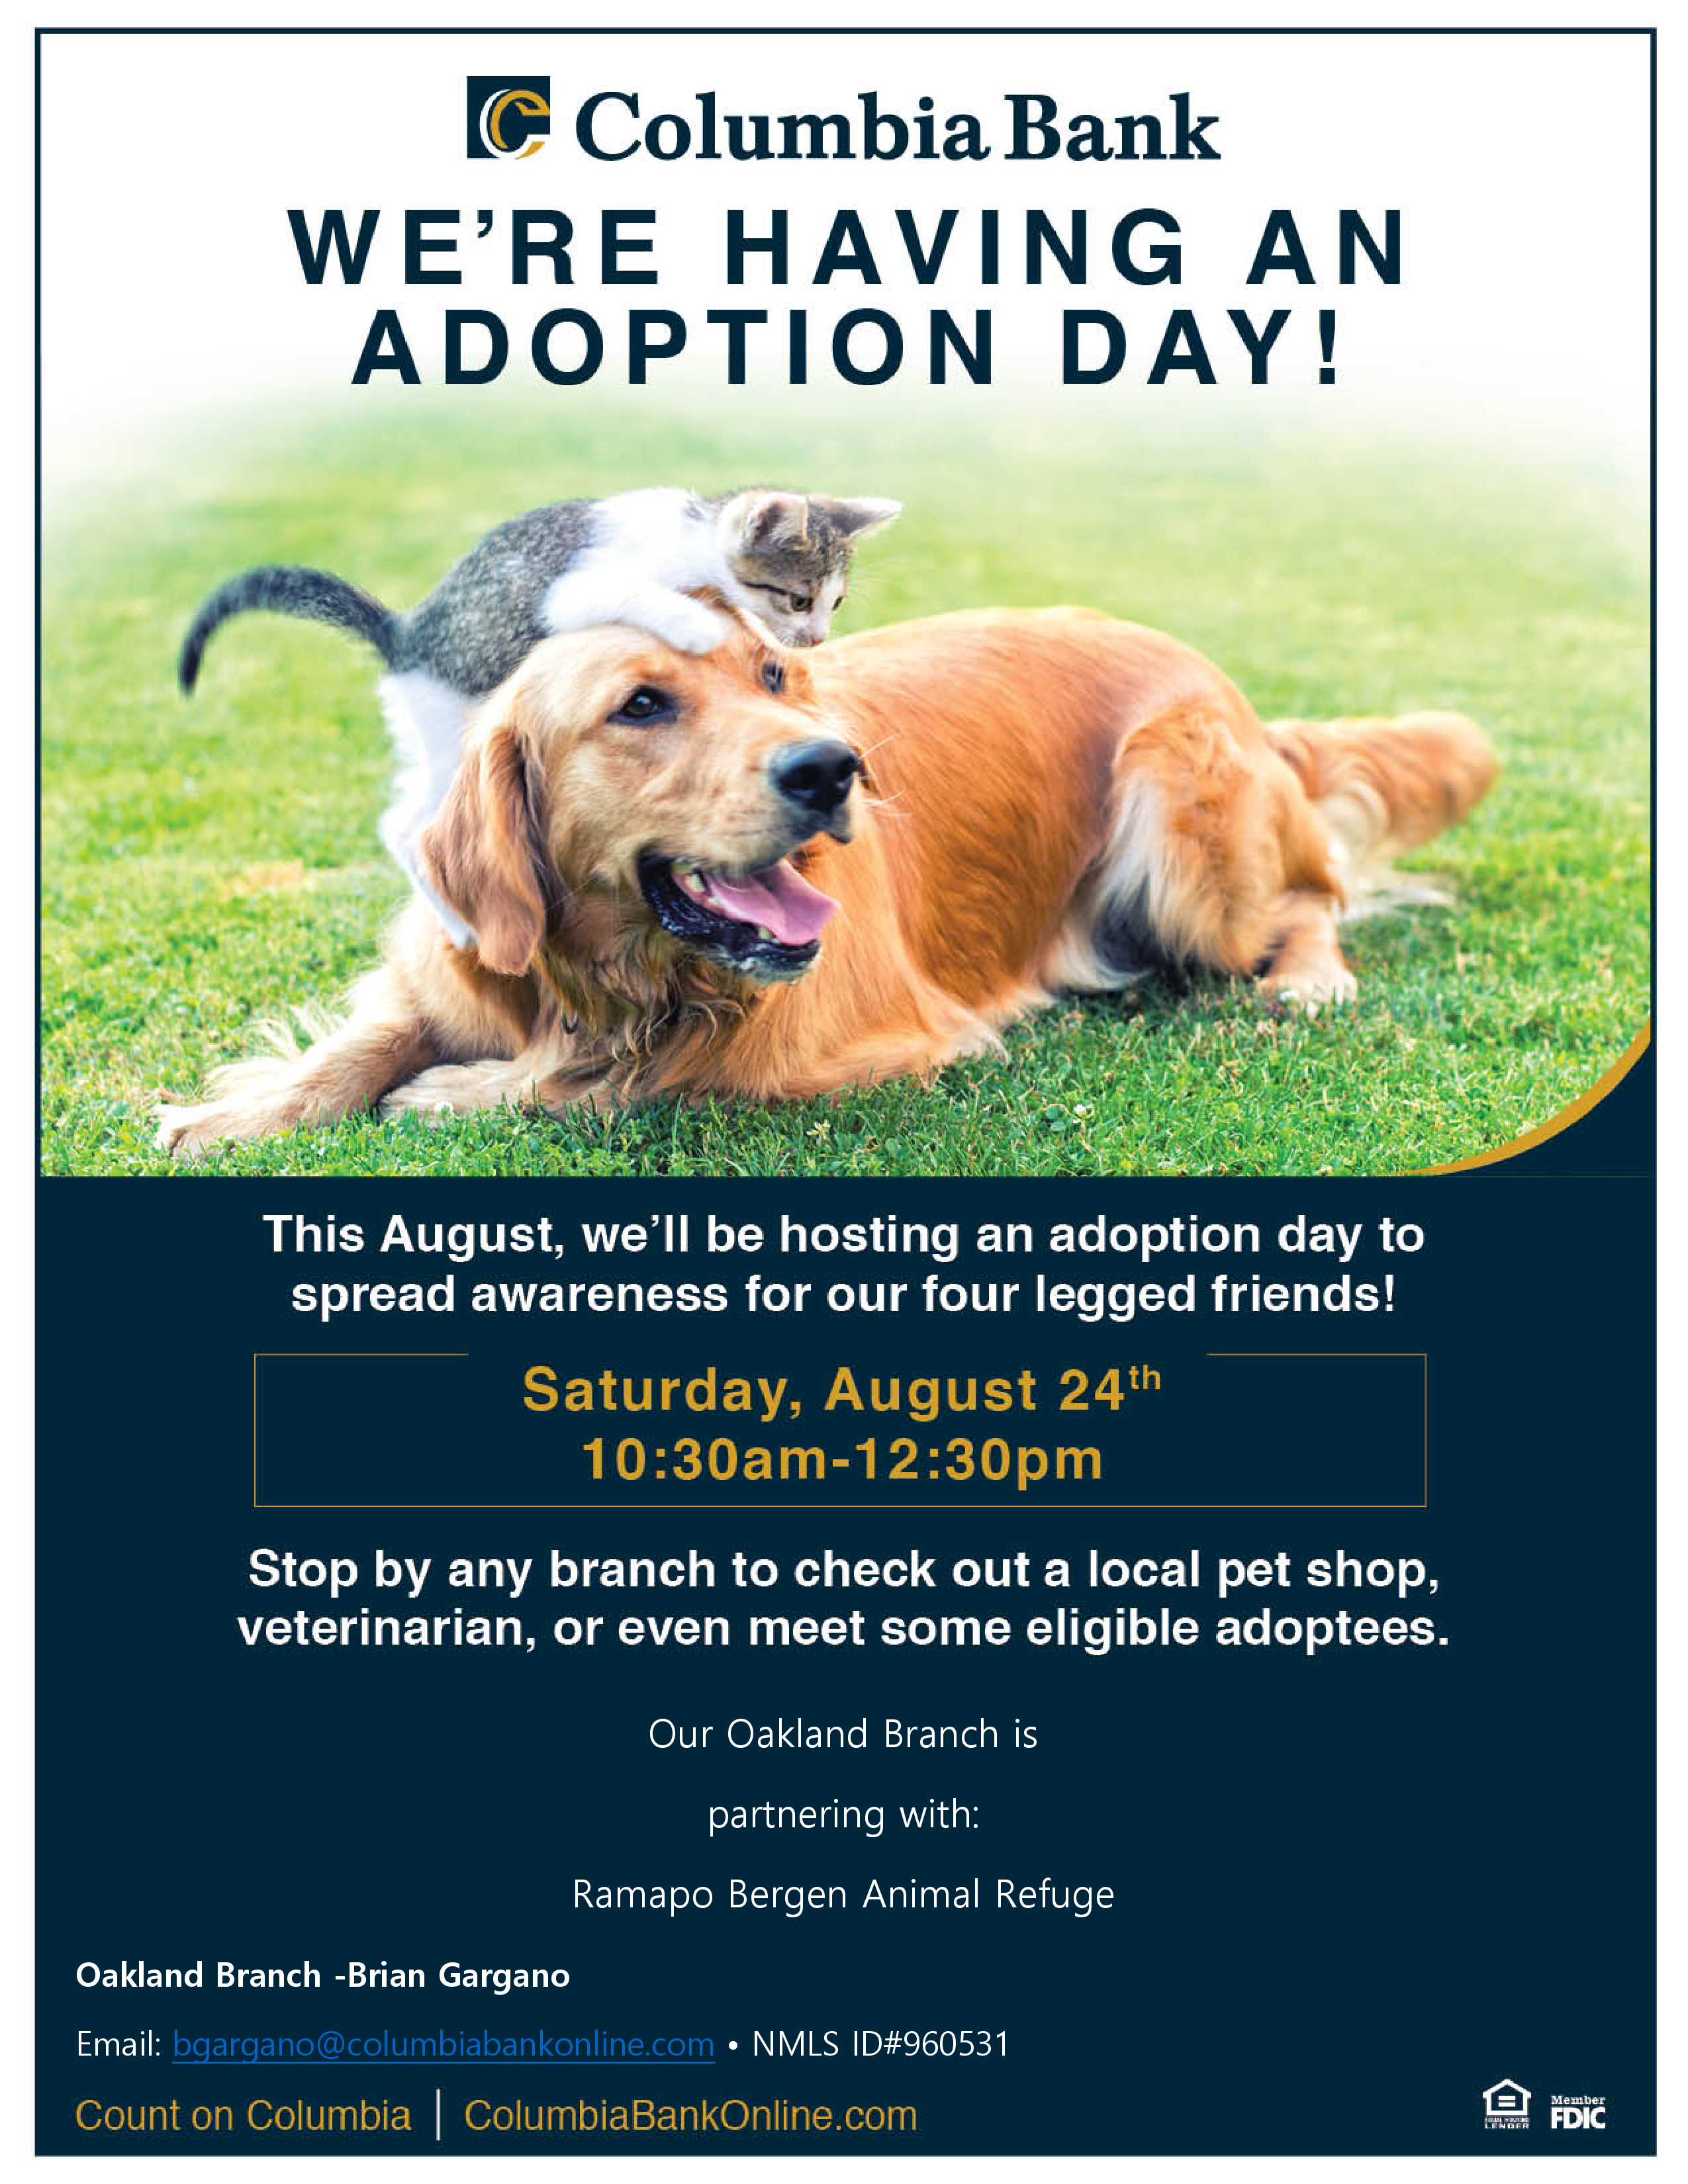 RBARI Visits Columbia Bank for Adoption Day